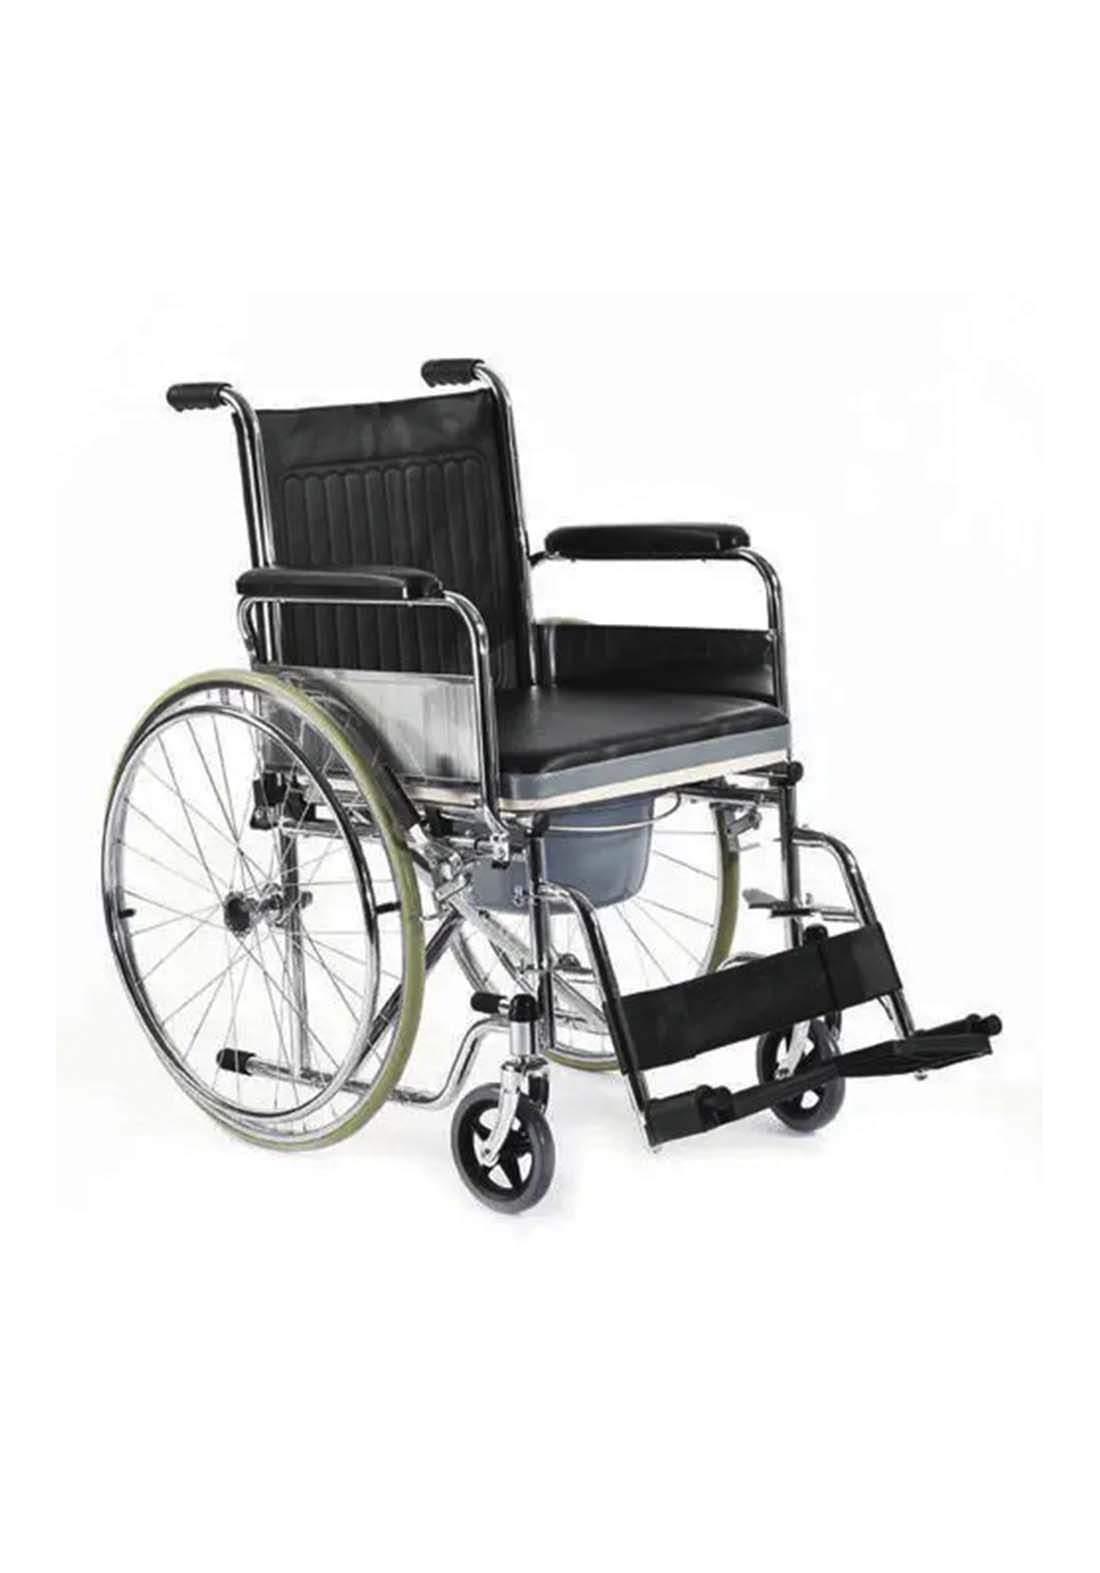 Foshan Fs 681 Manual Wheel Chair  كرسي متحرك